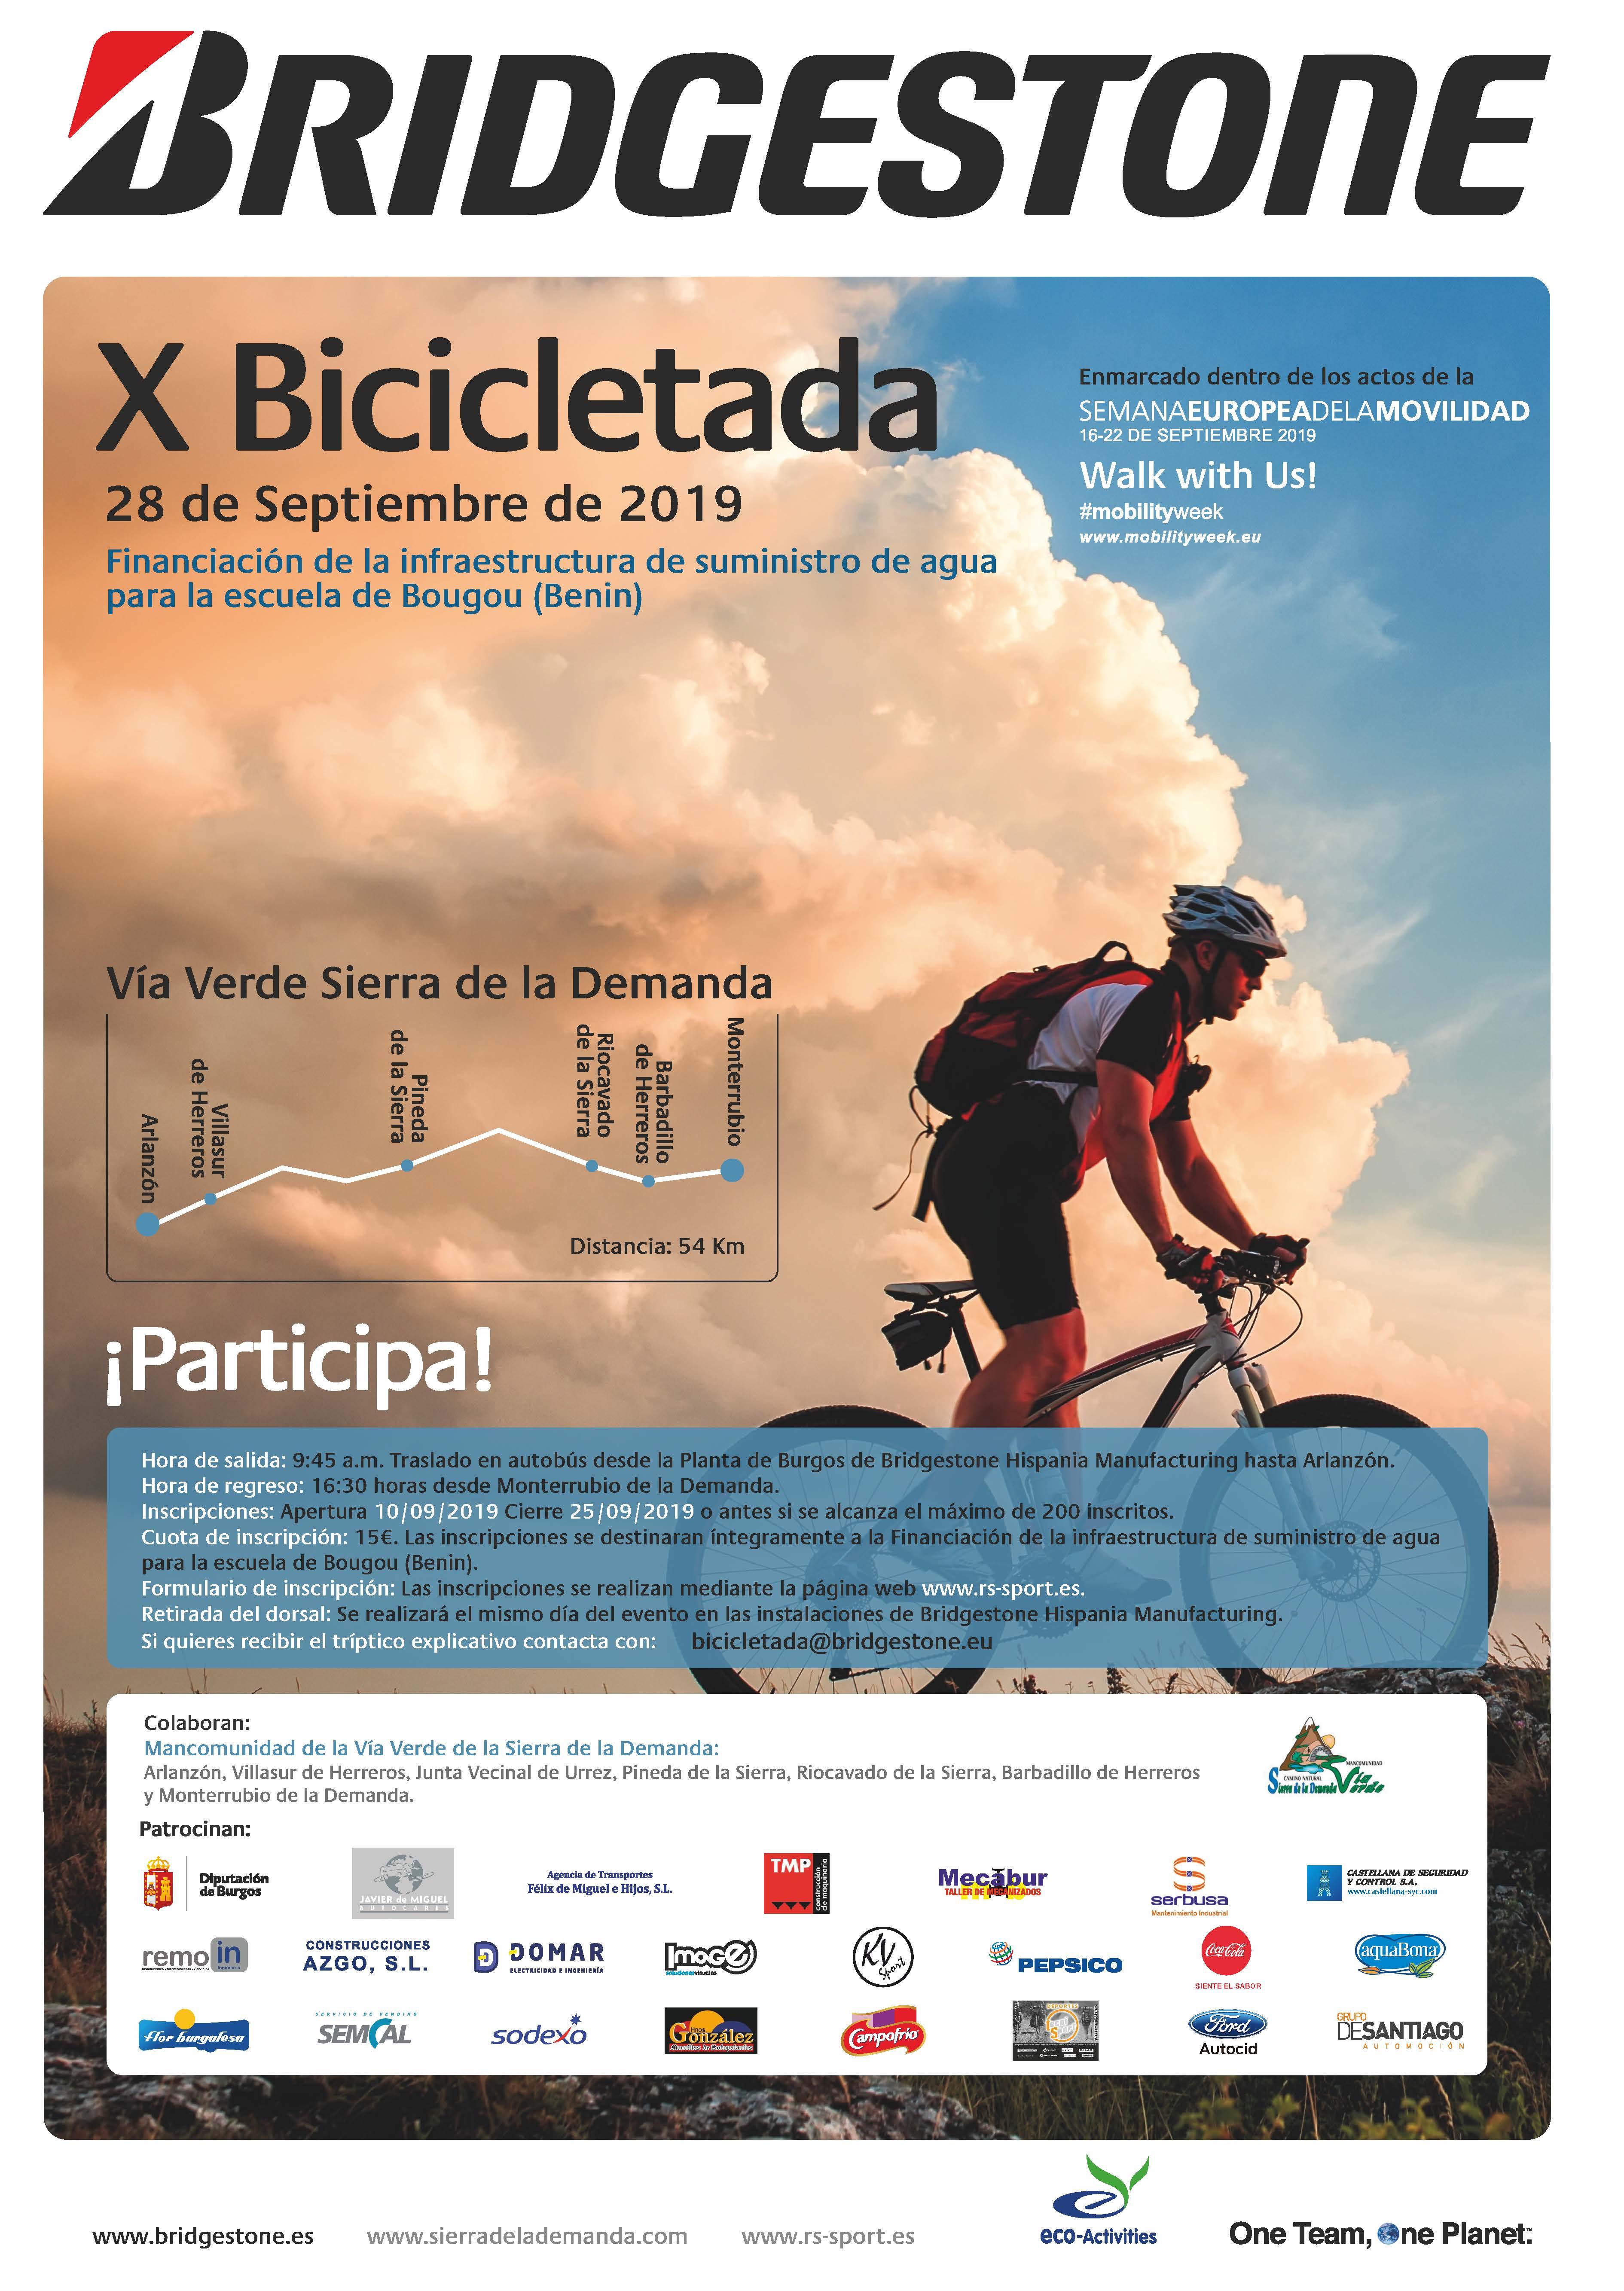 X Bicicletada Bridgestone